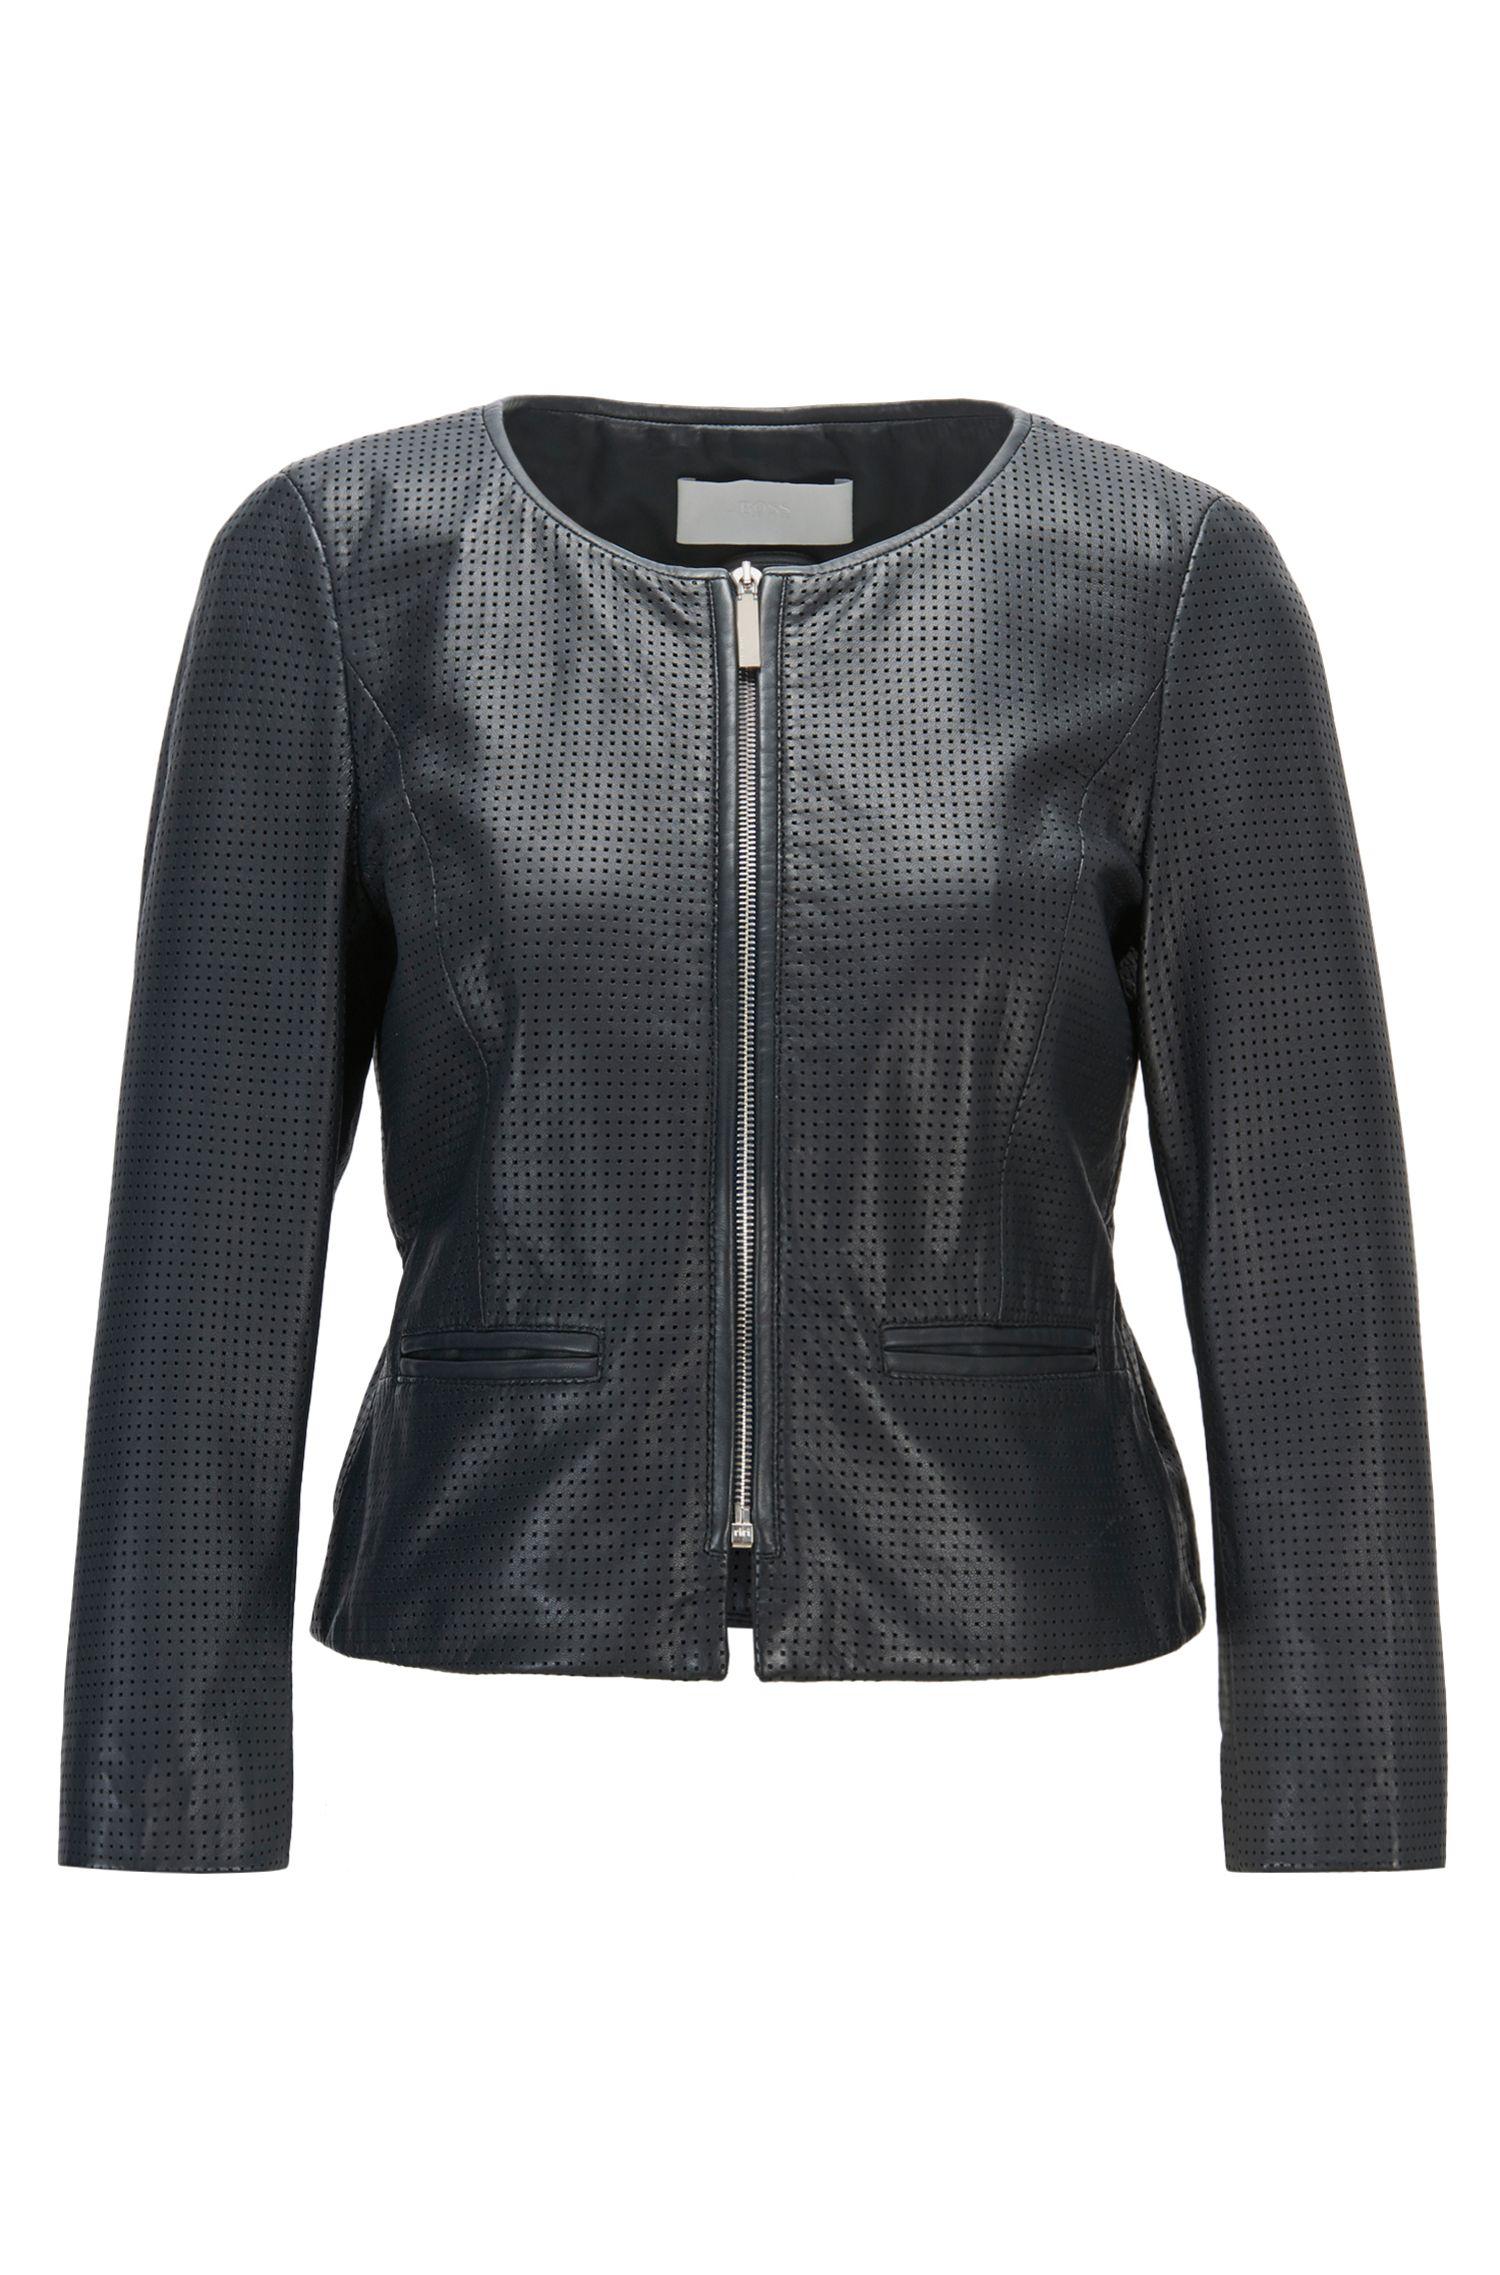 Perforated Lambskin Leather Jacket | Sallotina